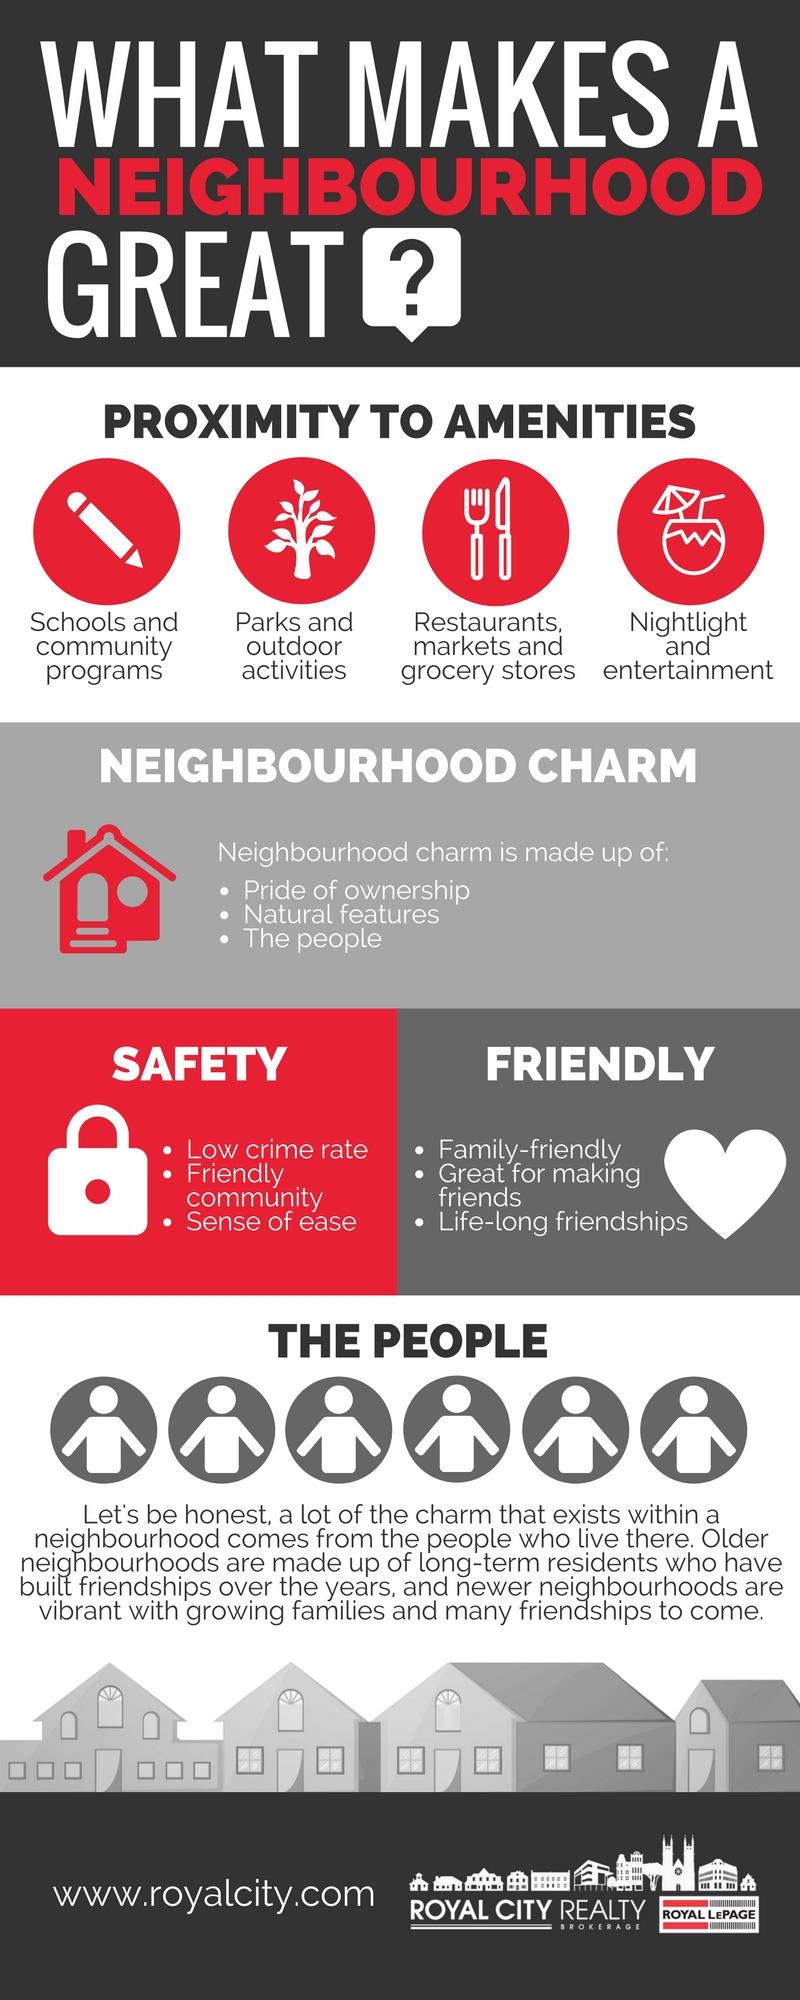 What makes a neighbourhood great